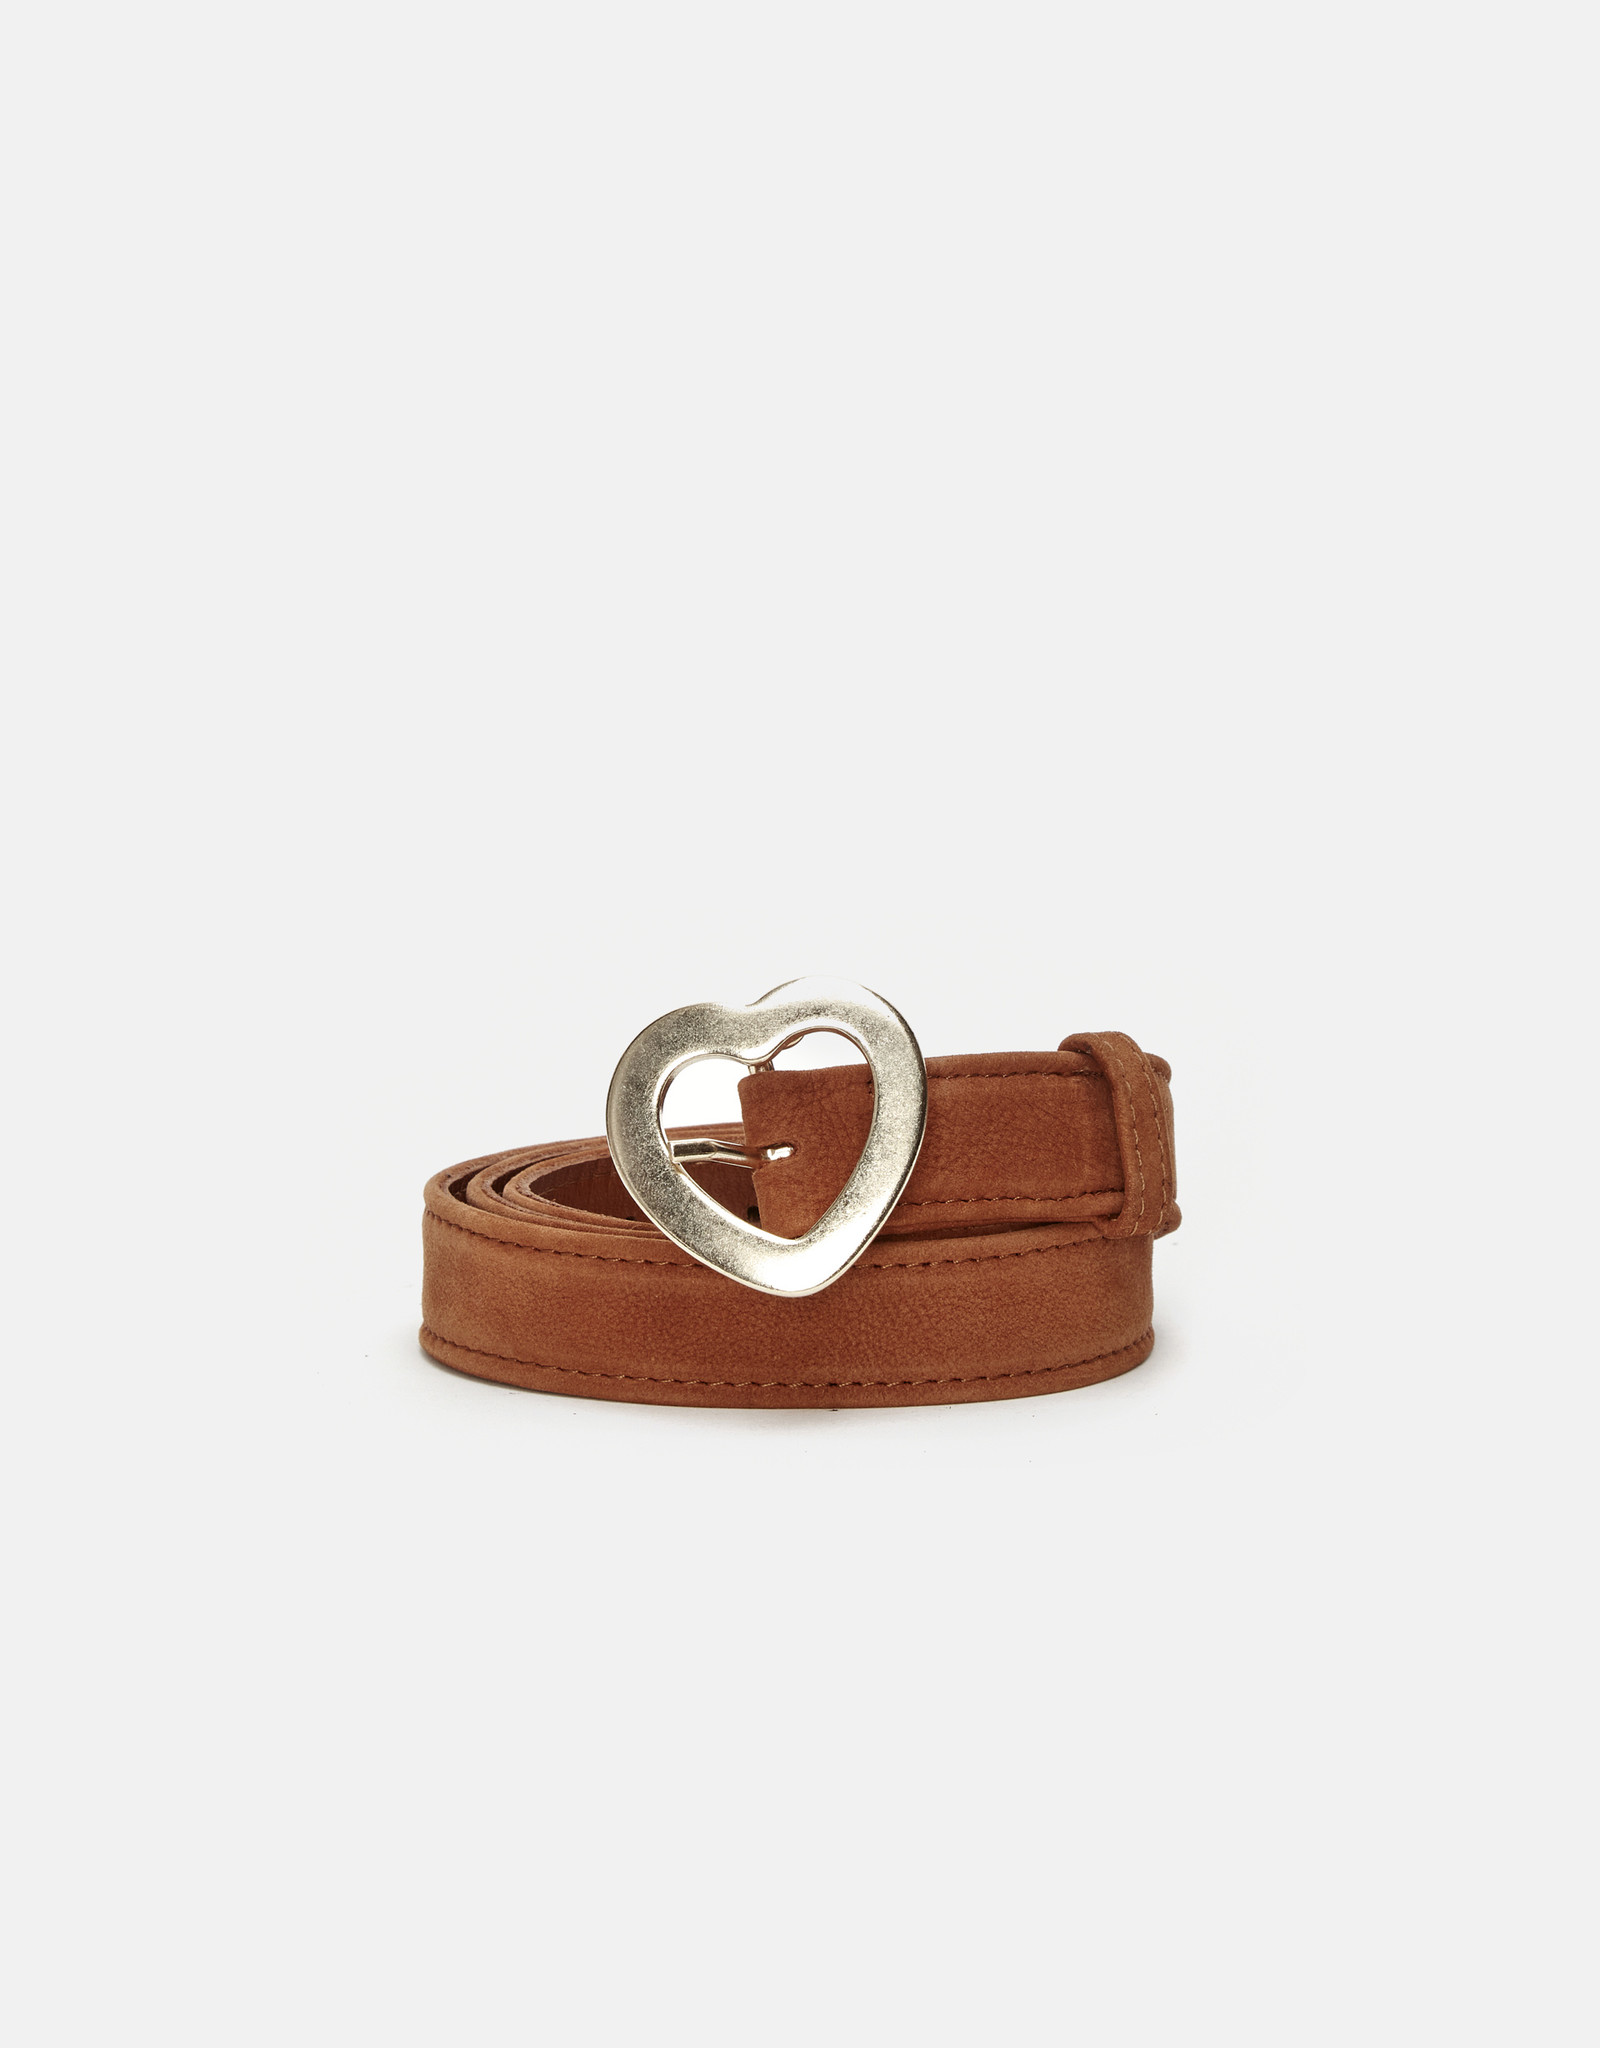 Fabienne Chapot Michelle Heart Belt Cognac